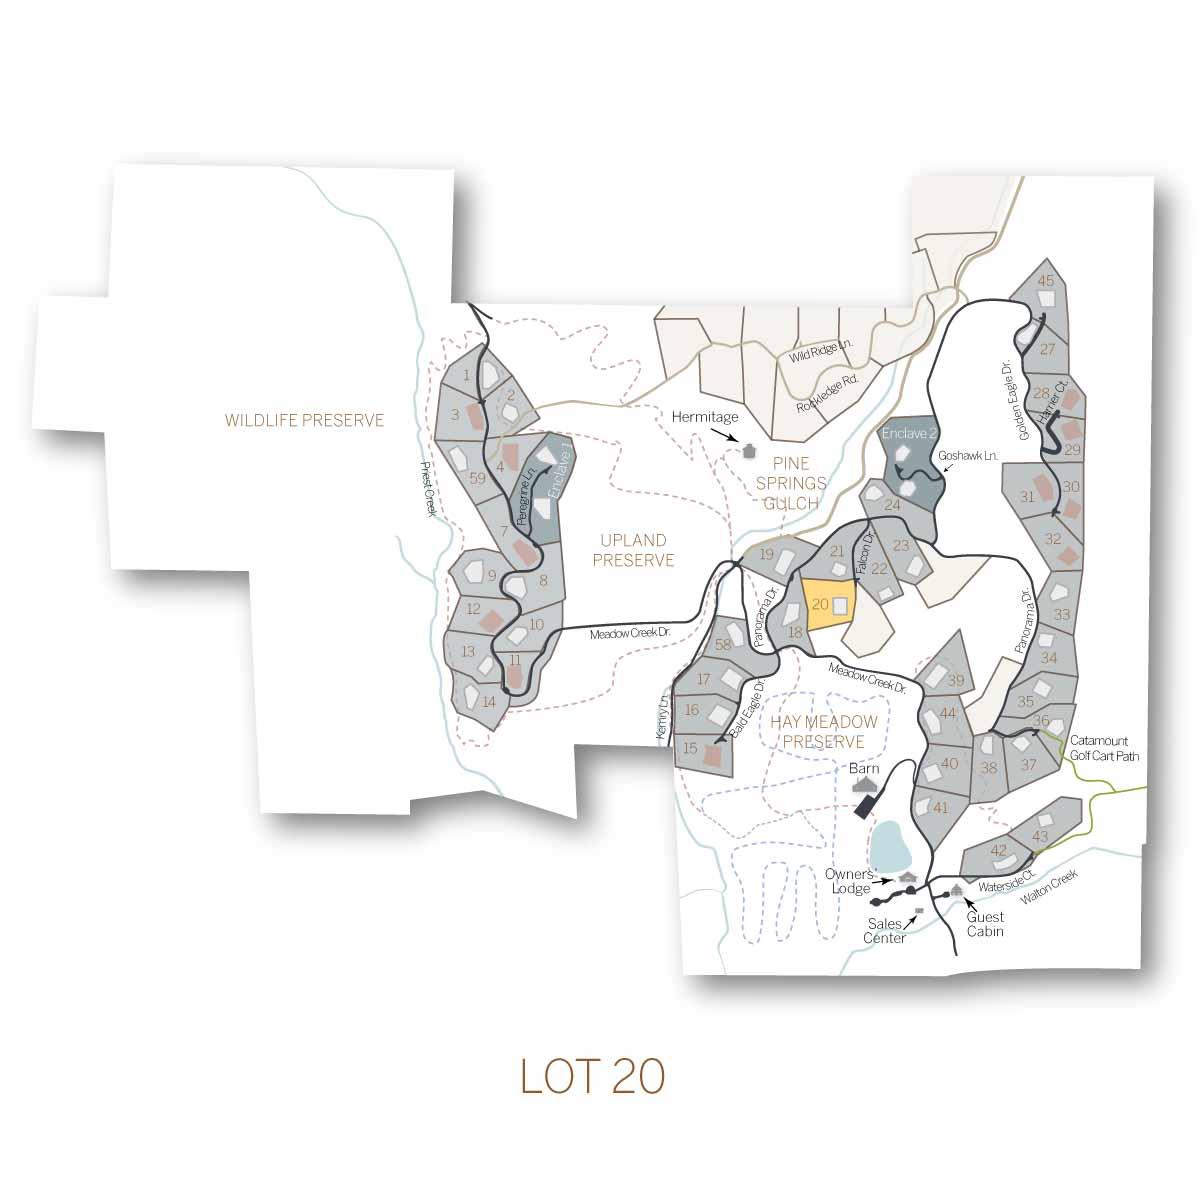 lot 20 1 - Homesite #20